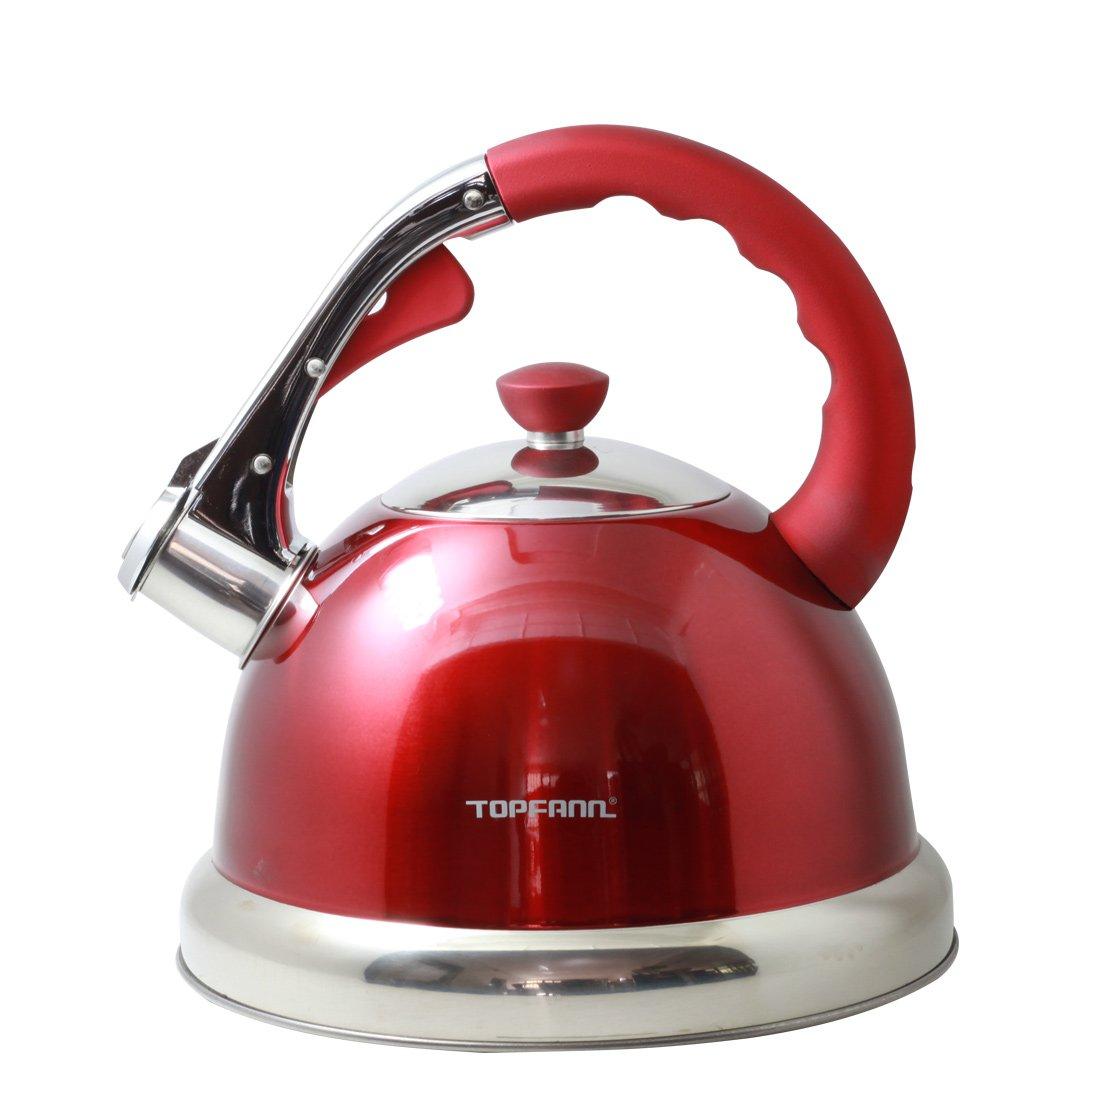 Riwendell 3.2 Quart Whistling Tea Kettle Stainless Steel Bell Shape StoveTop Teapot (GS-04555HY-3L, Blue)